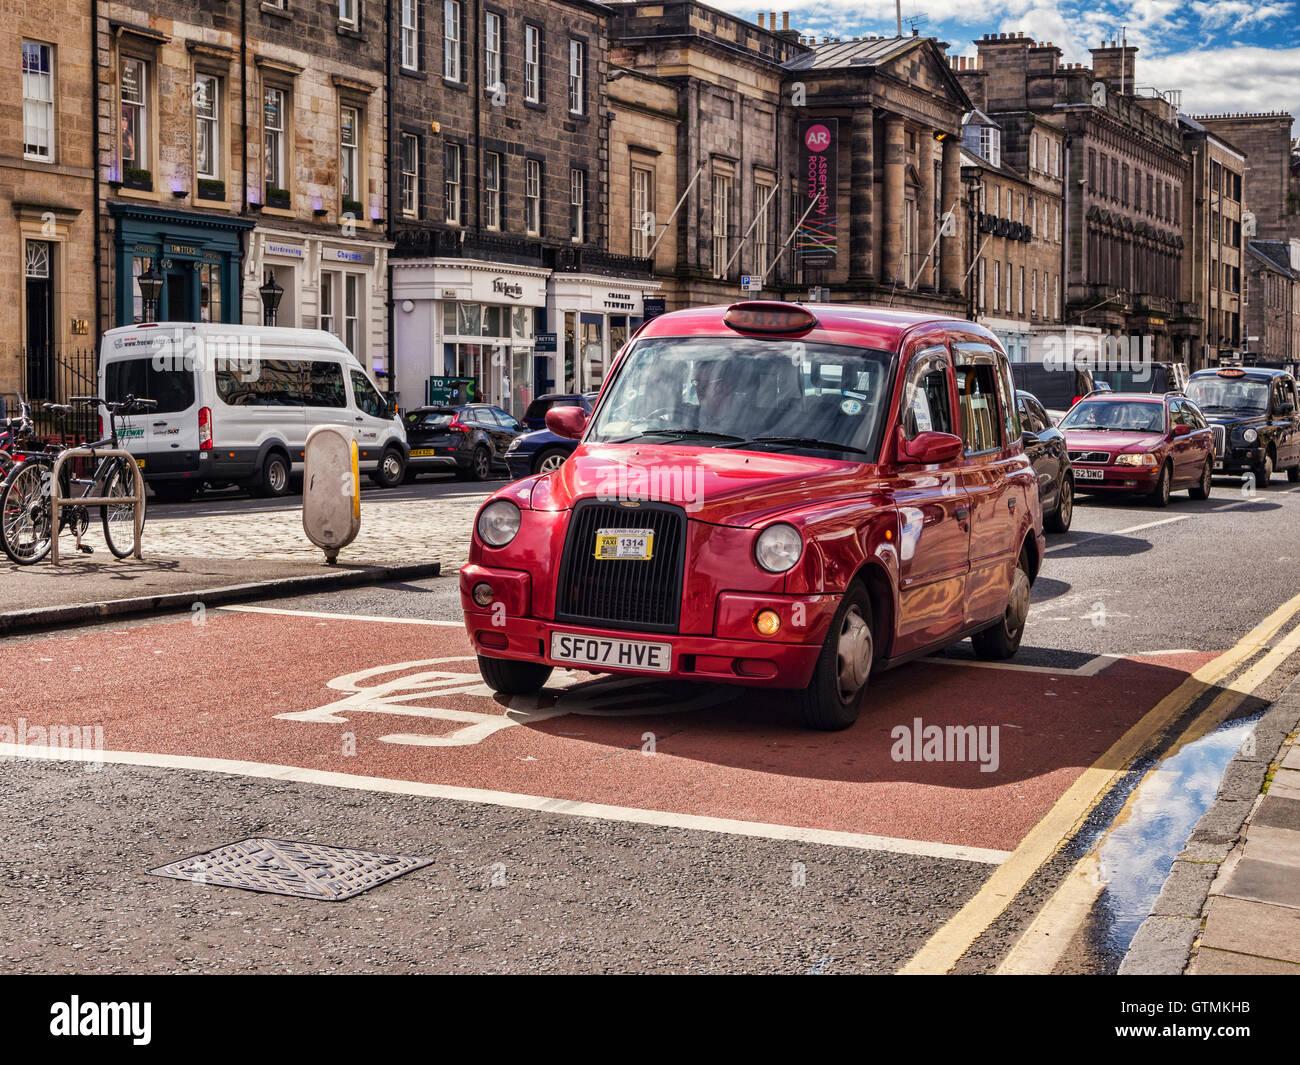 Taxi Rojo en George Street, Edimburgo, Escocia, Reino Unido Imagen De Stock